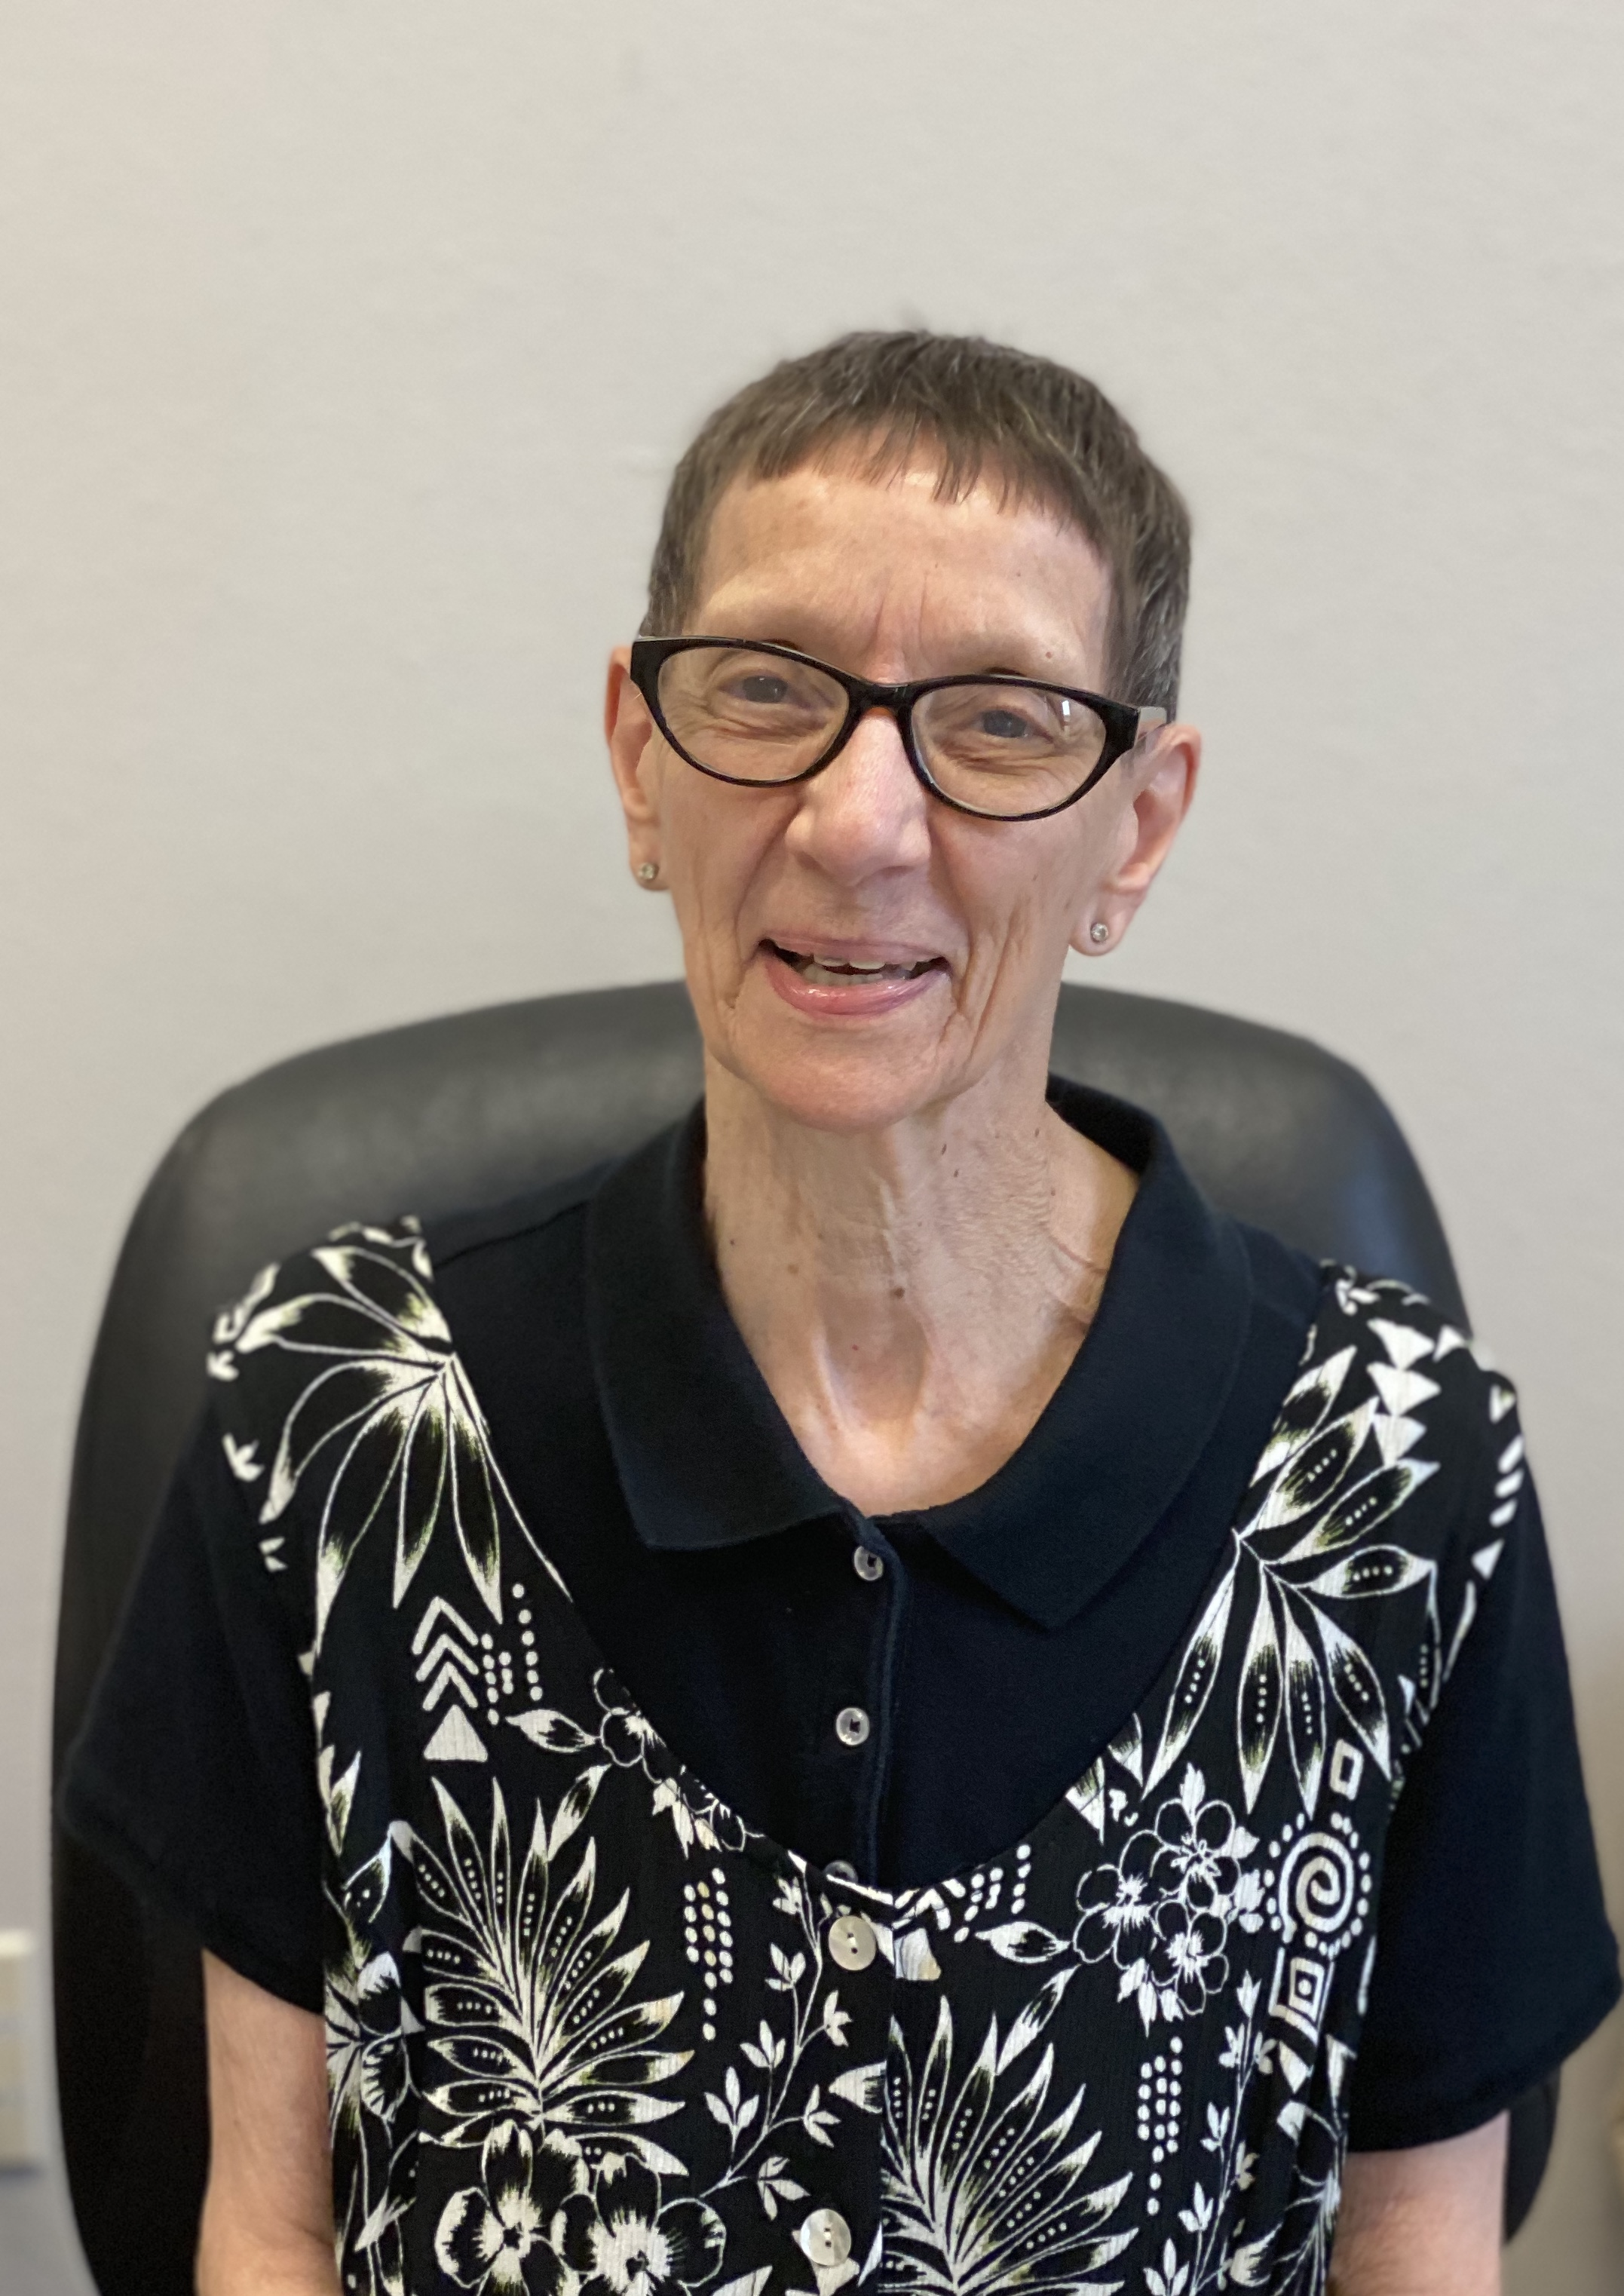 Julie Weed, Church Secretary